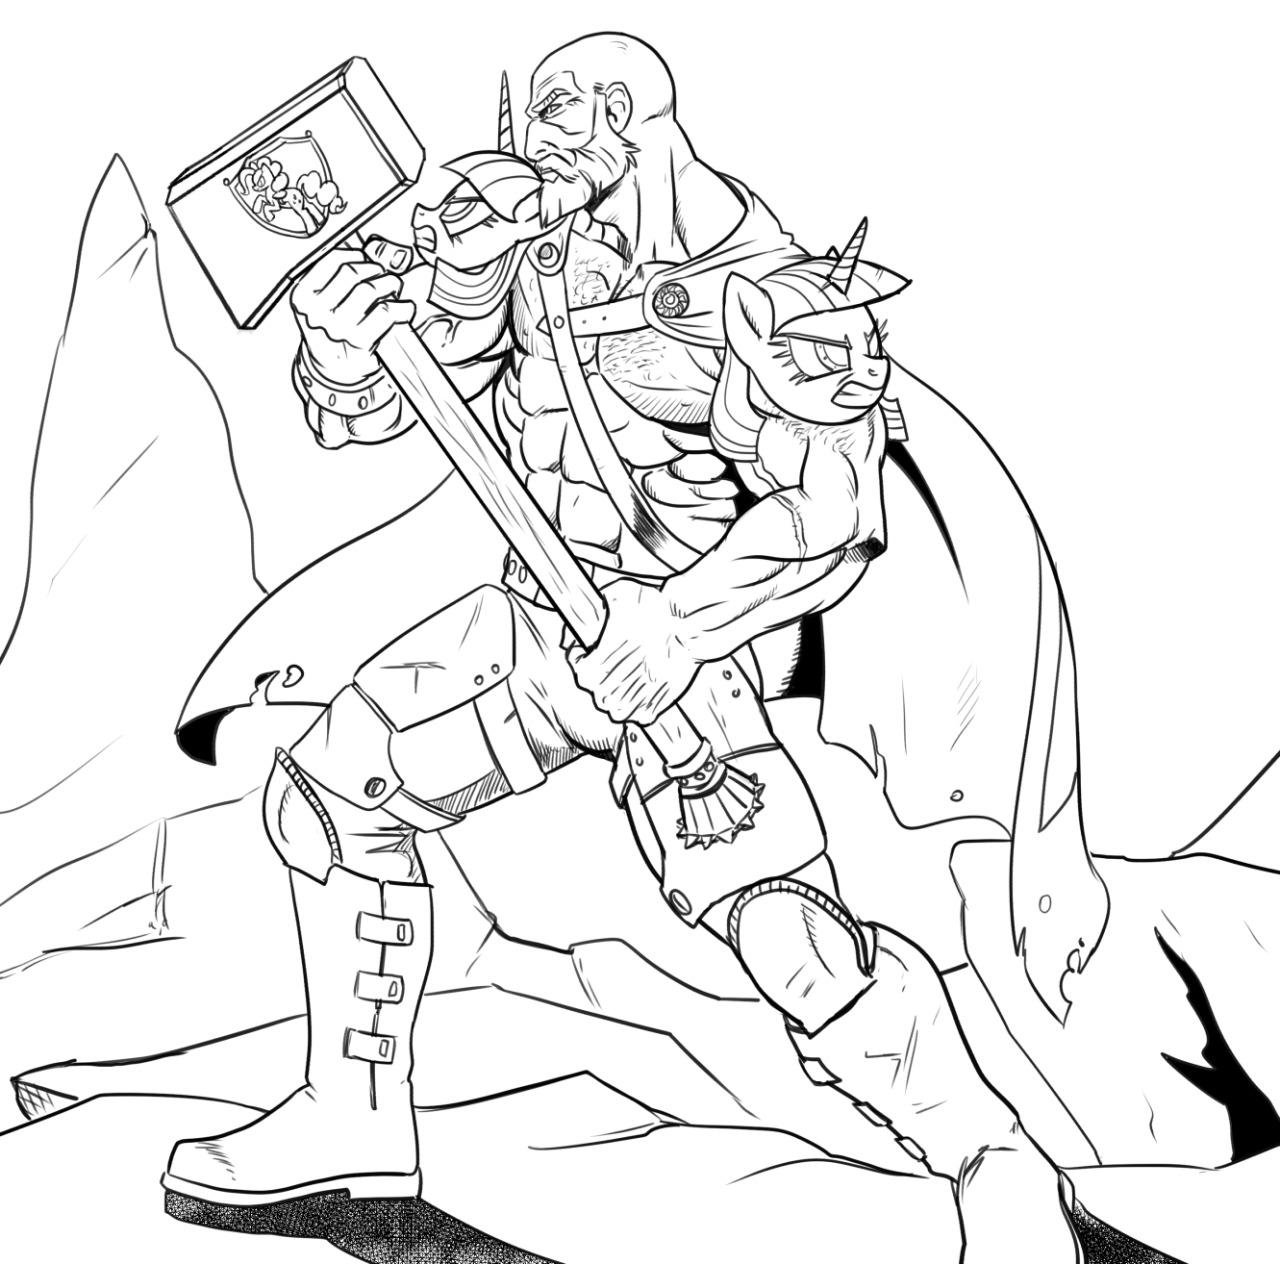 Anon's Pie Adventure equestria daily - mlp stuff!: pencils and his provocative